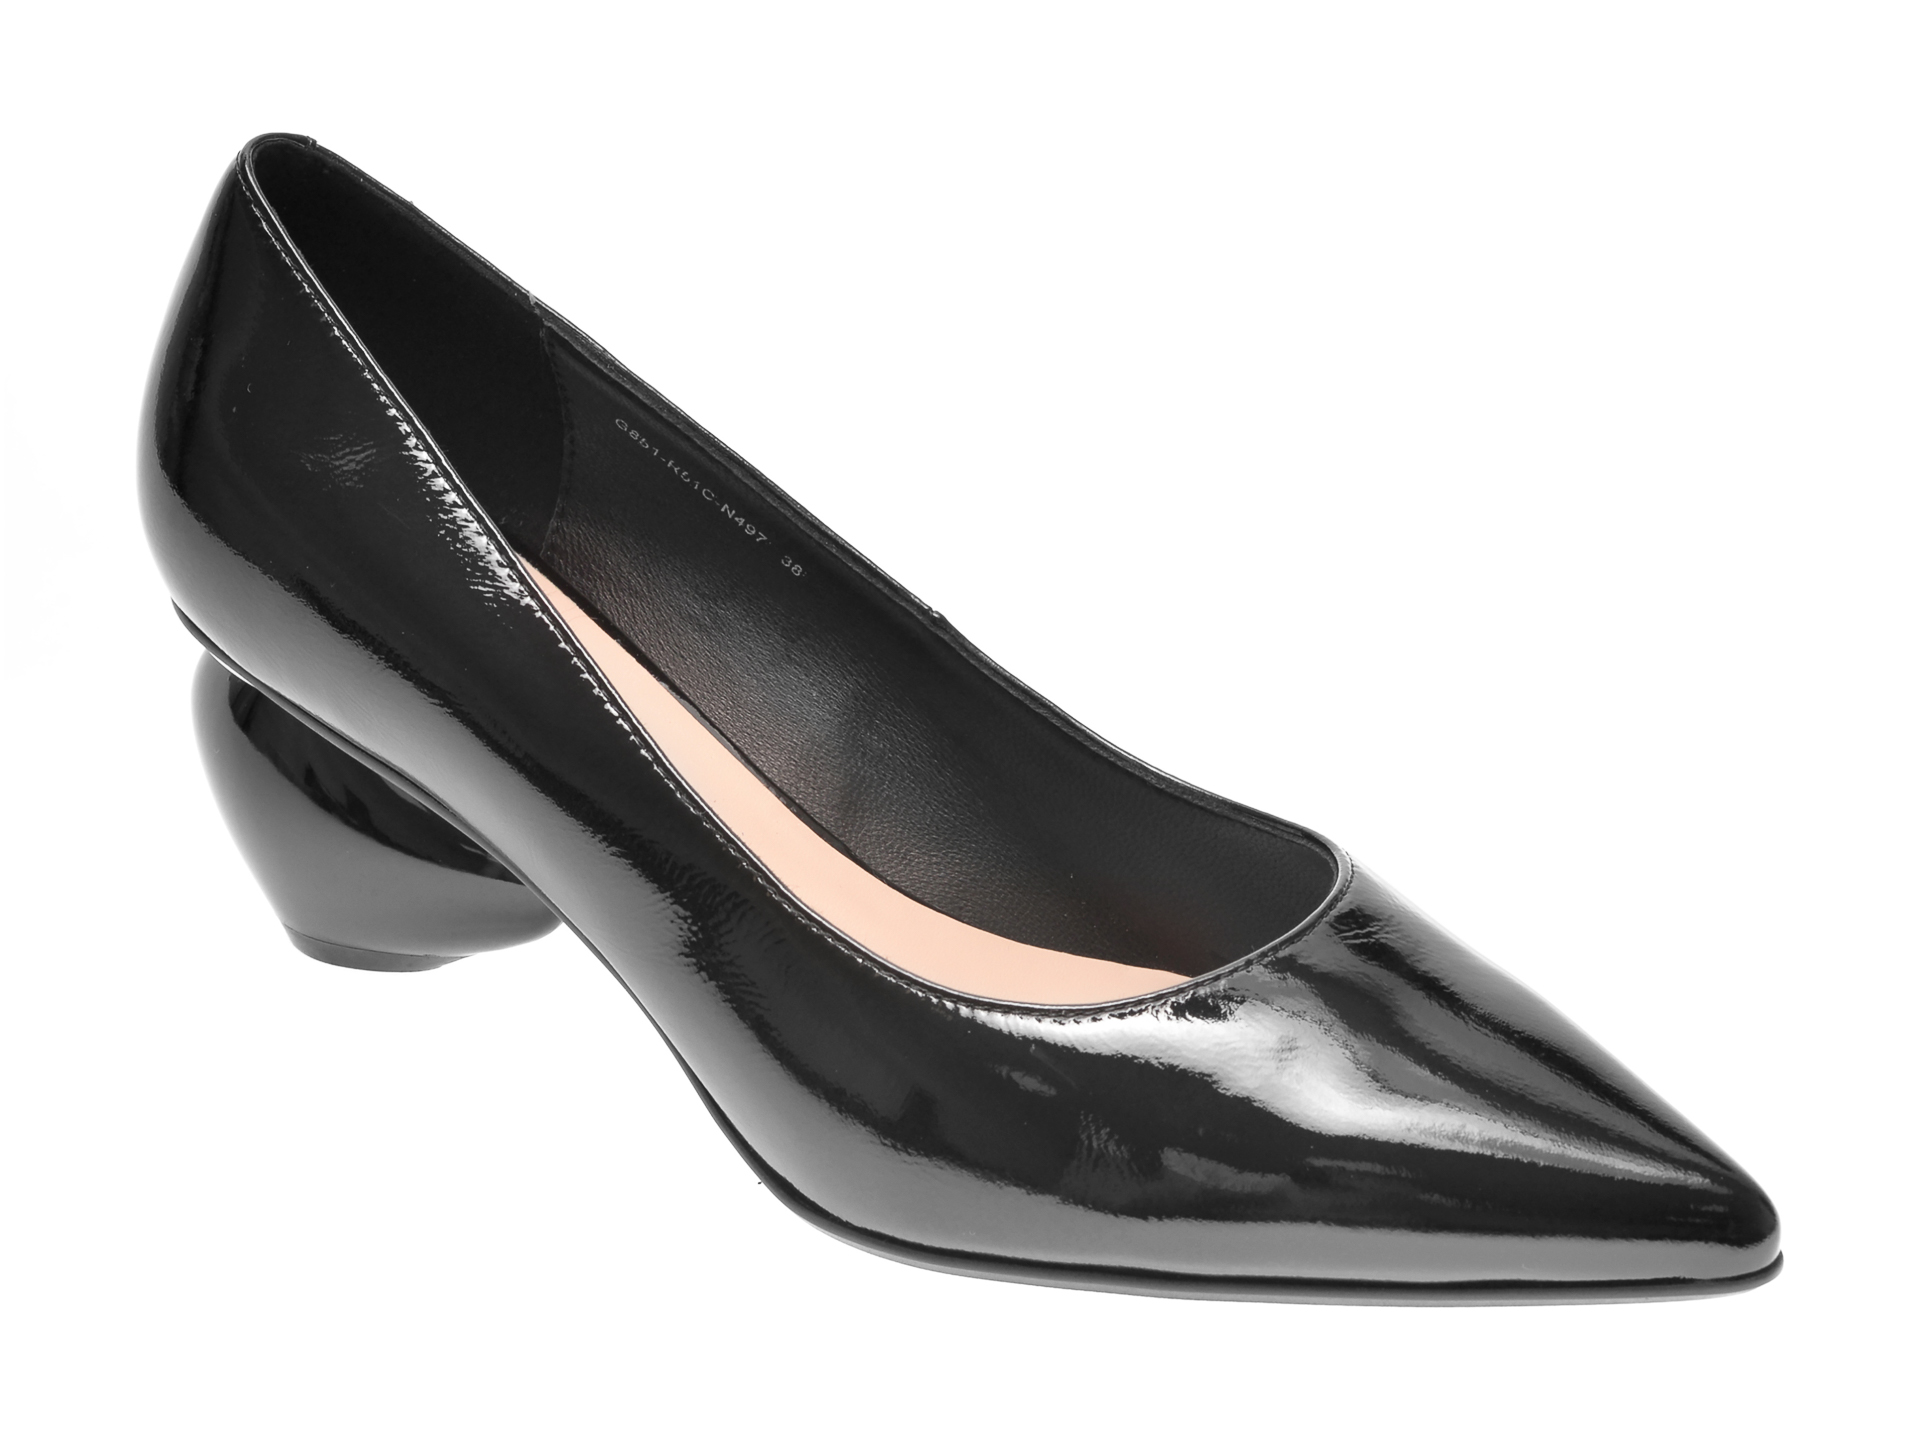 Pantofi EPICA negri, G851R51, din piele naturala lacuita imagine otter.ro 2021